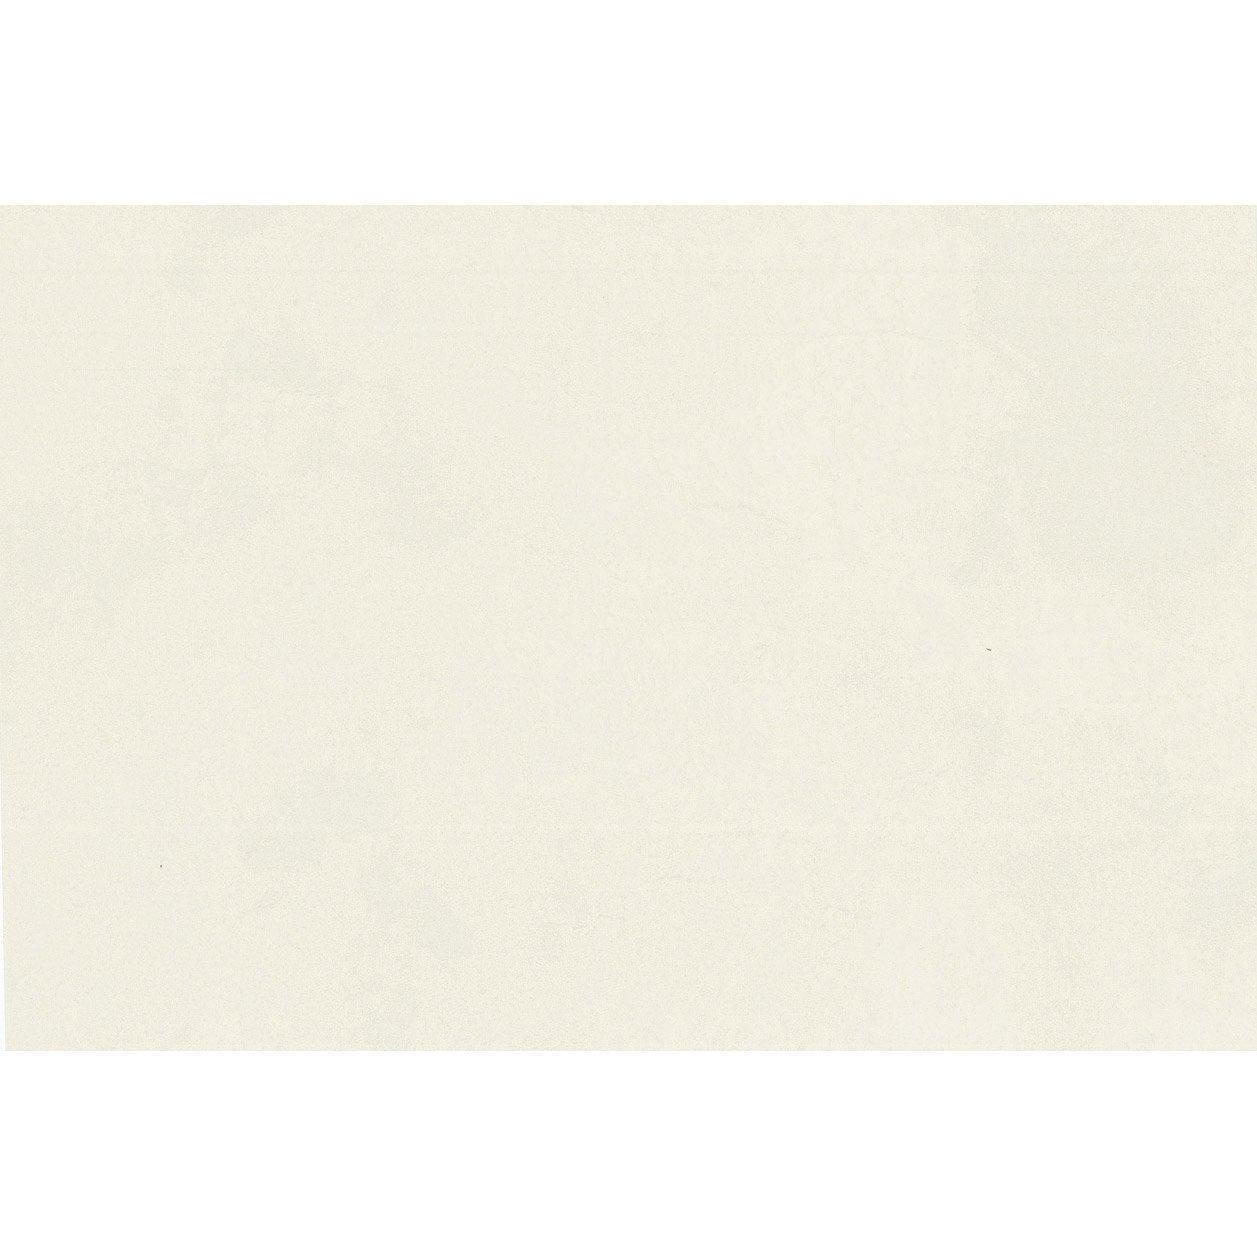 papier peint beige papier italian color leroy merlin. Black Bedroom Furniture Sets. Home Design Ideas